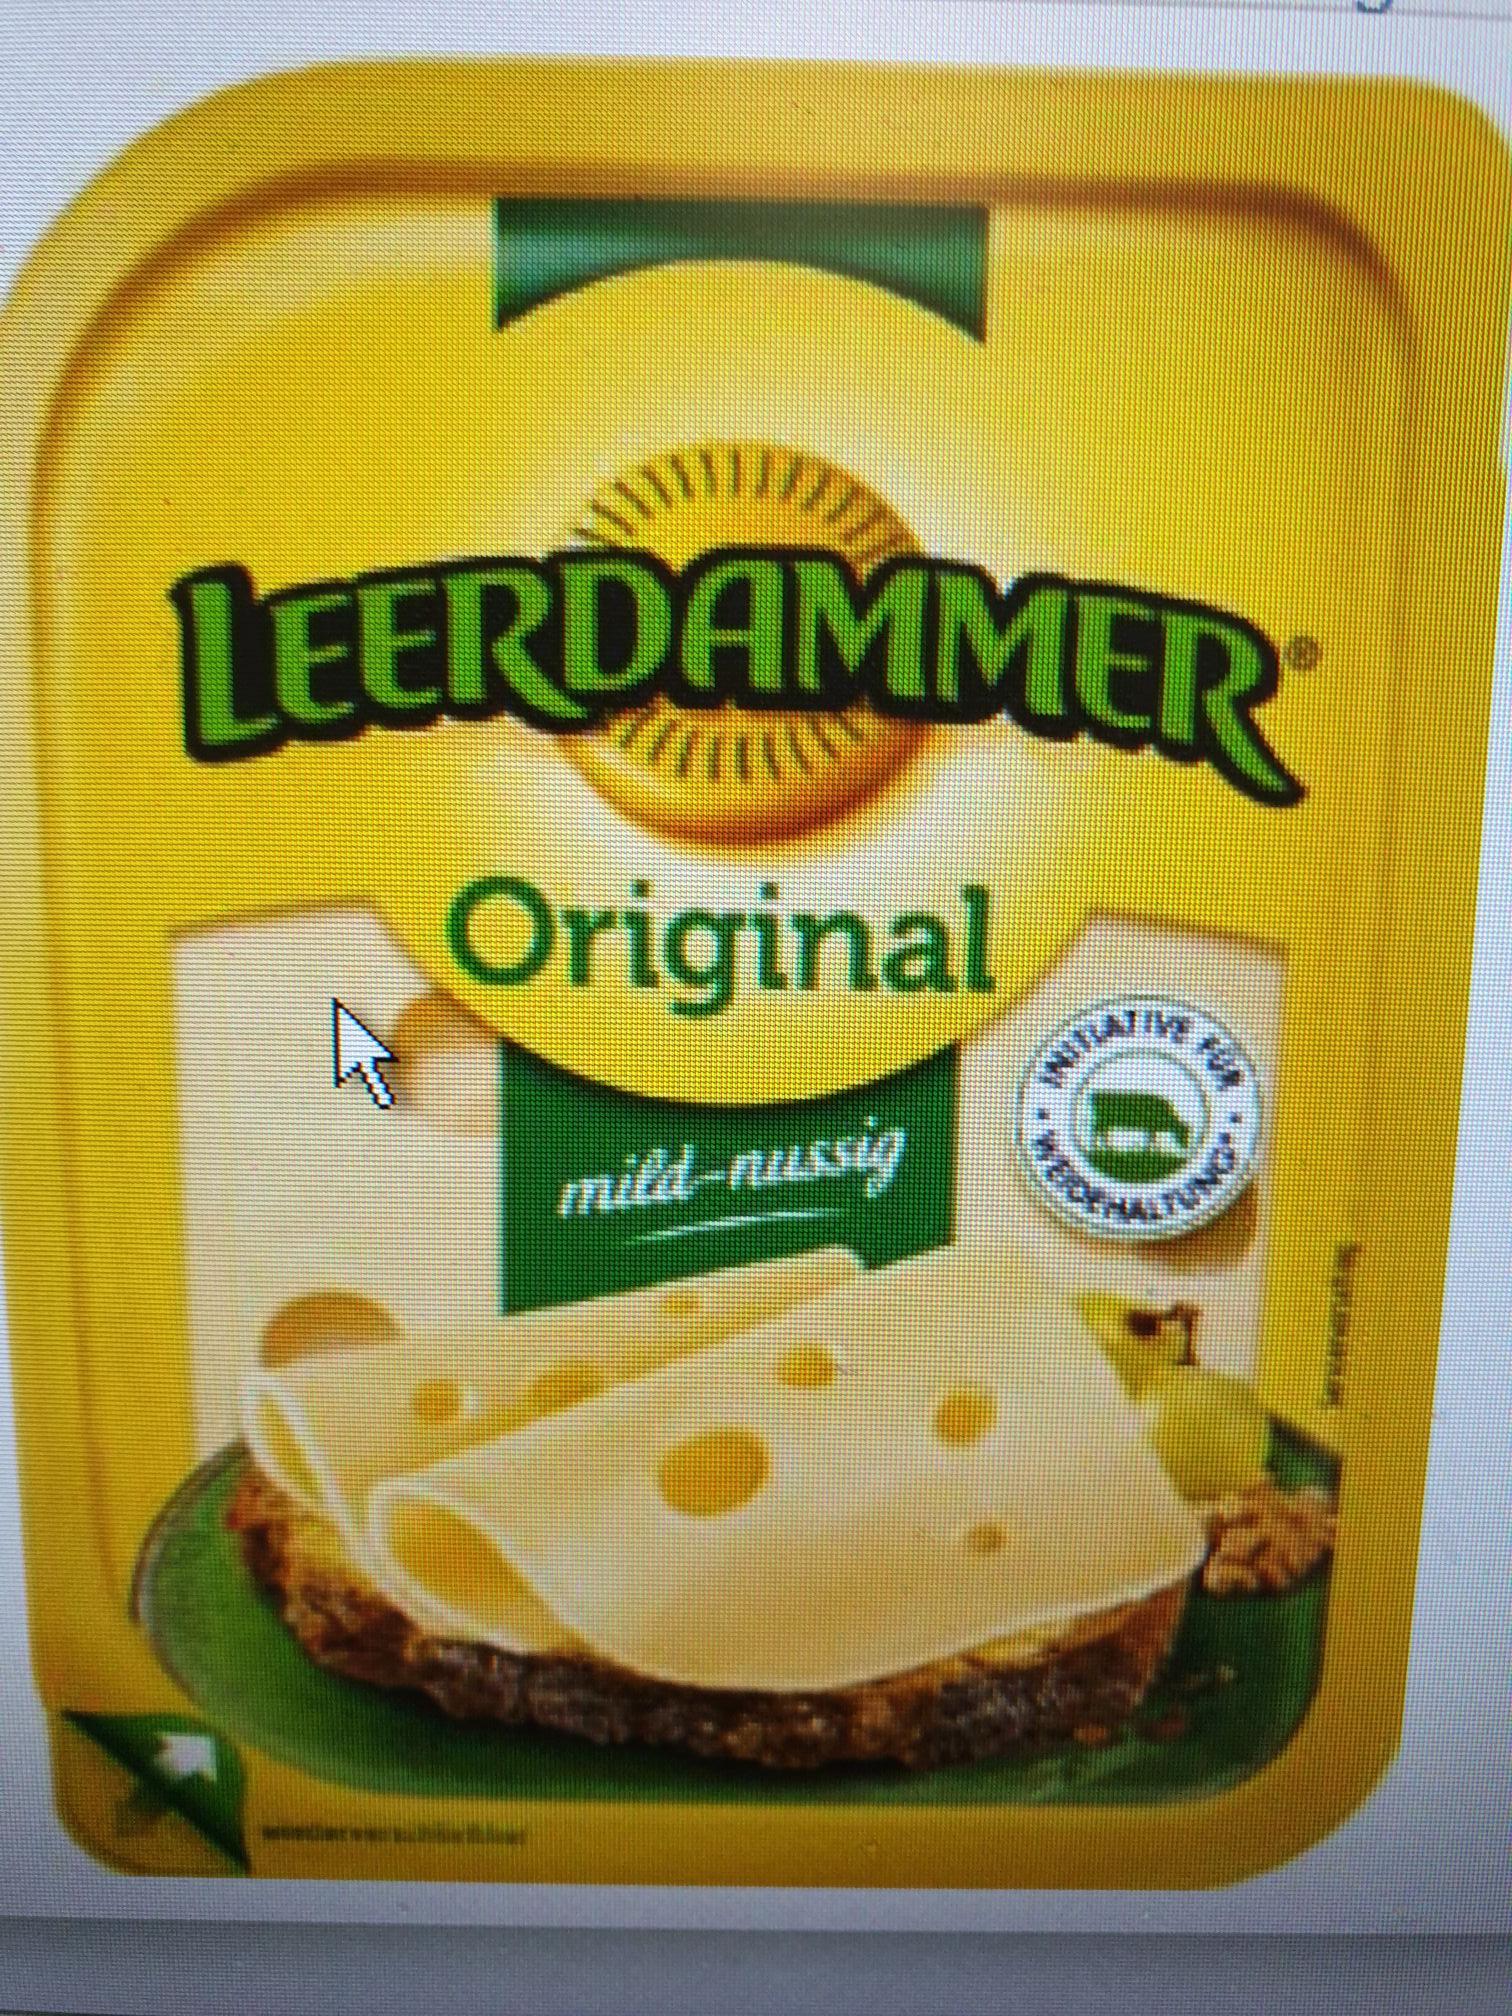 [Lokal Rostock] Leerdammer Käse, verschiedene Sorten, Cap Markt Seidelstrasse